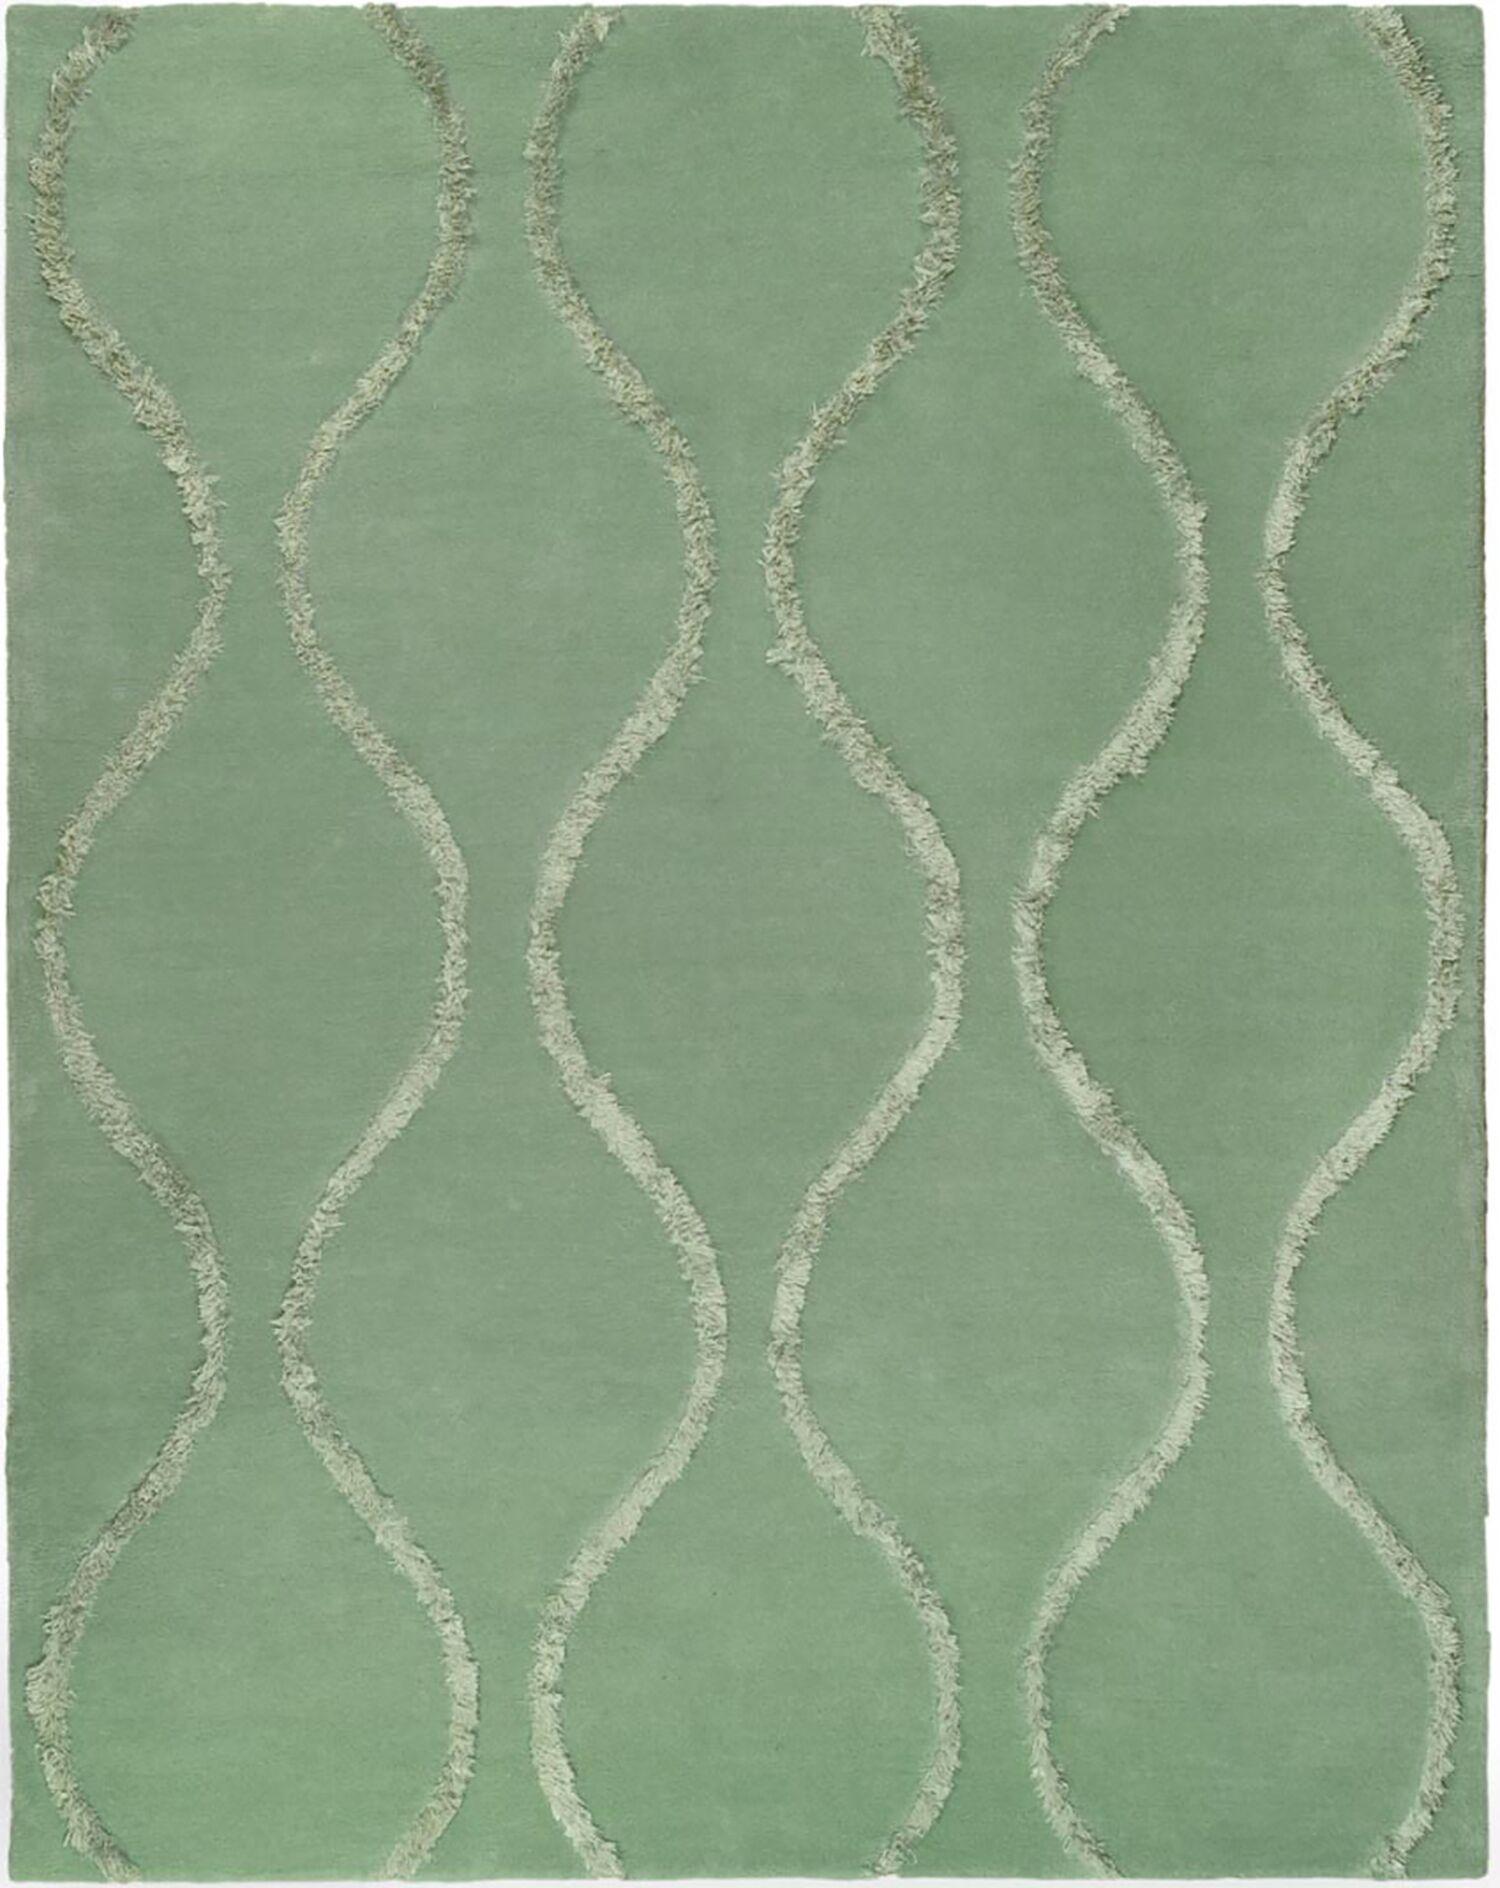 Woodburn Aqua / Green Contemporary Rug Rug Size: Rectangle 7'6